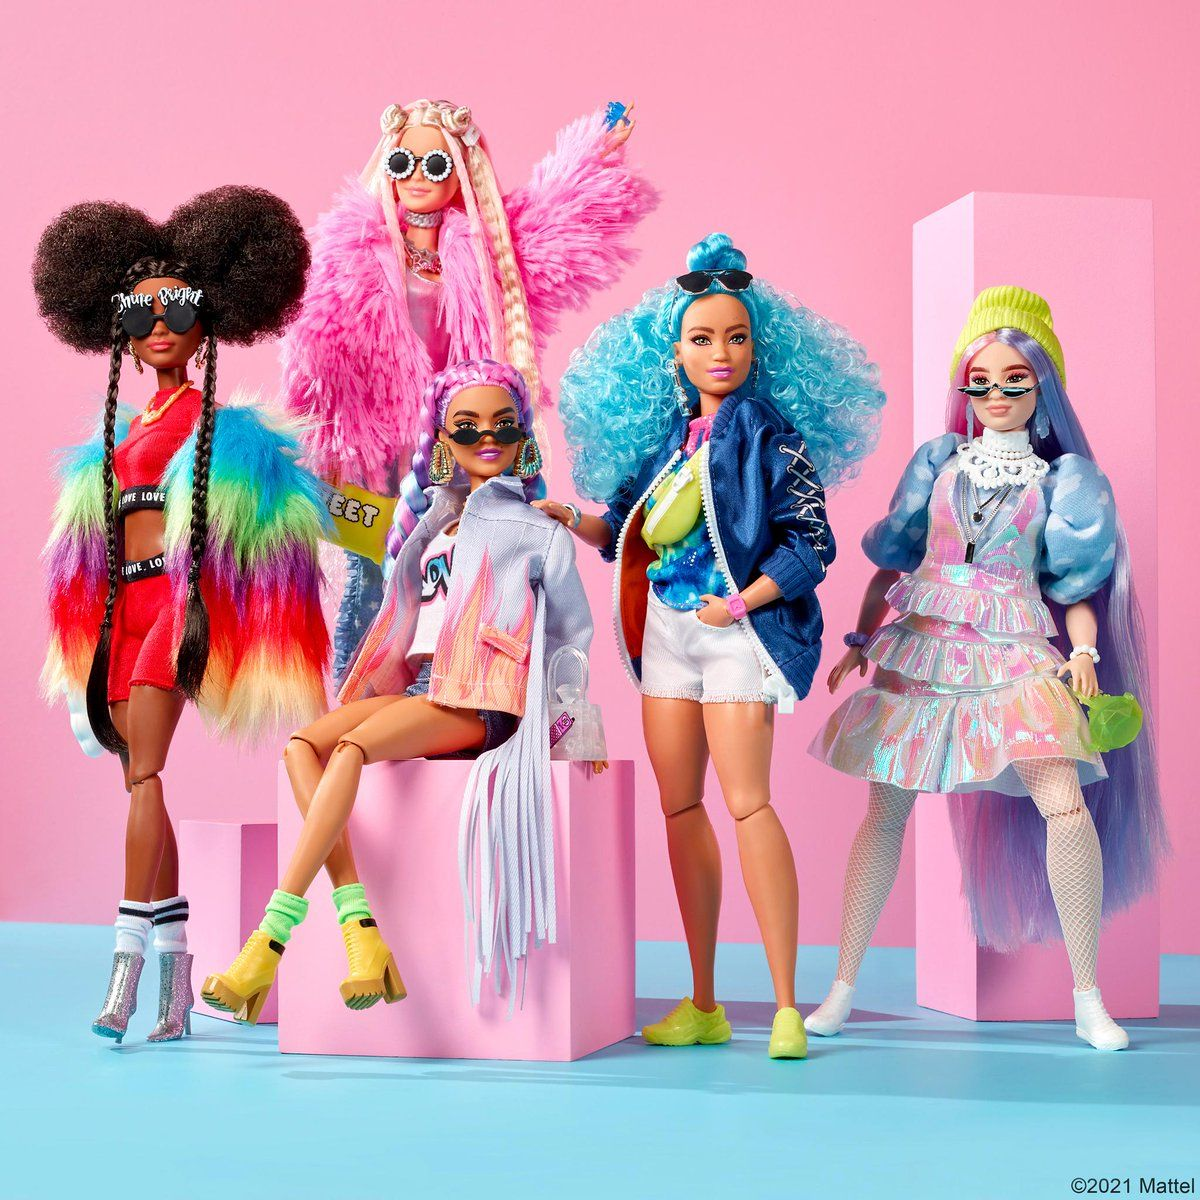 "Barbie on Twitter: ""Born to be bold. #BarbieEXTRA https://t.co/Mwuq8VWQMC  https://t.co/UBRw94A6Lj"" / Twitter"